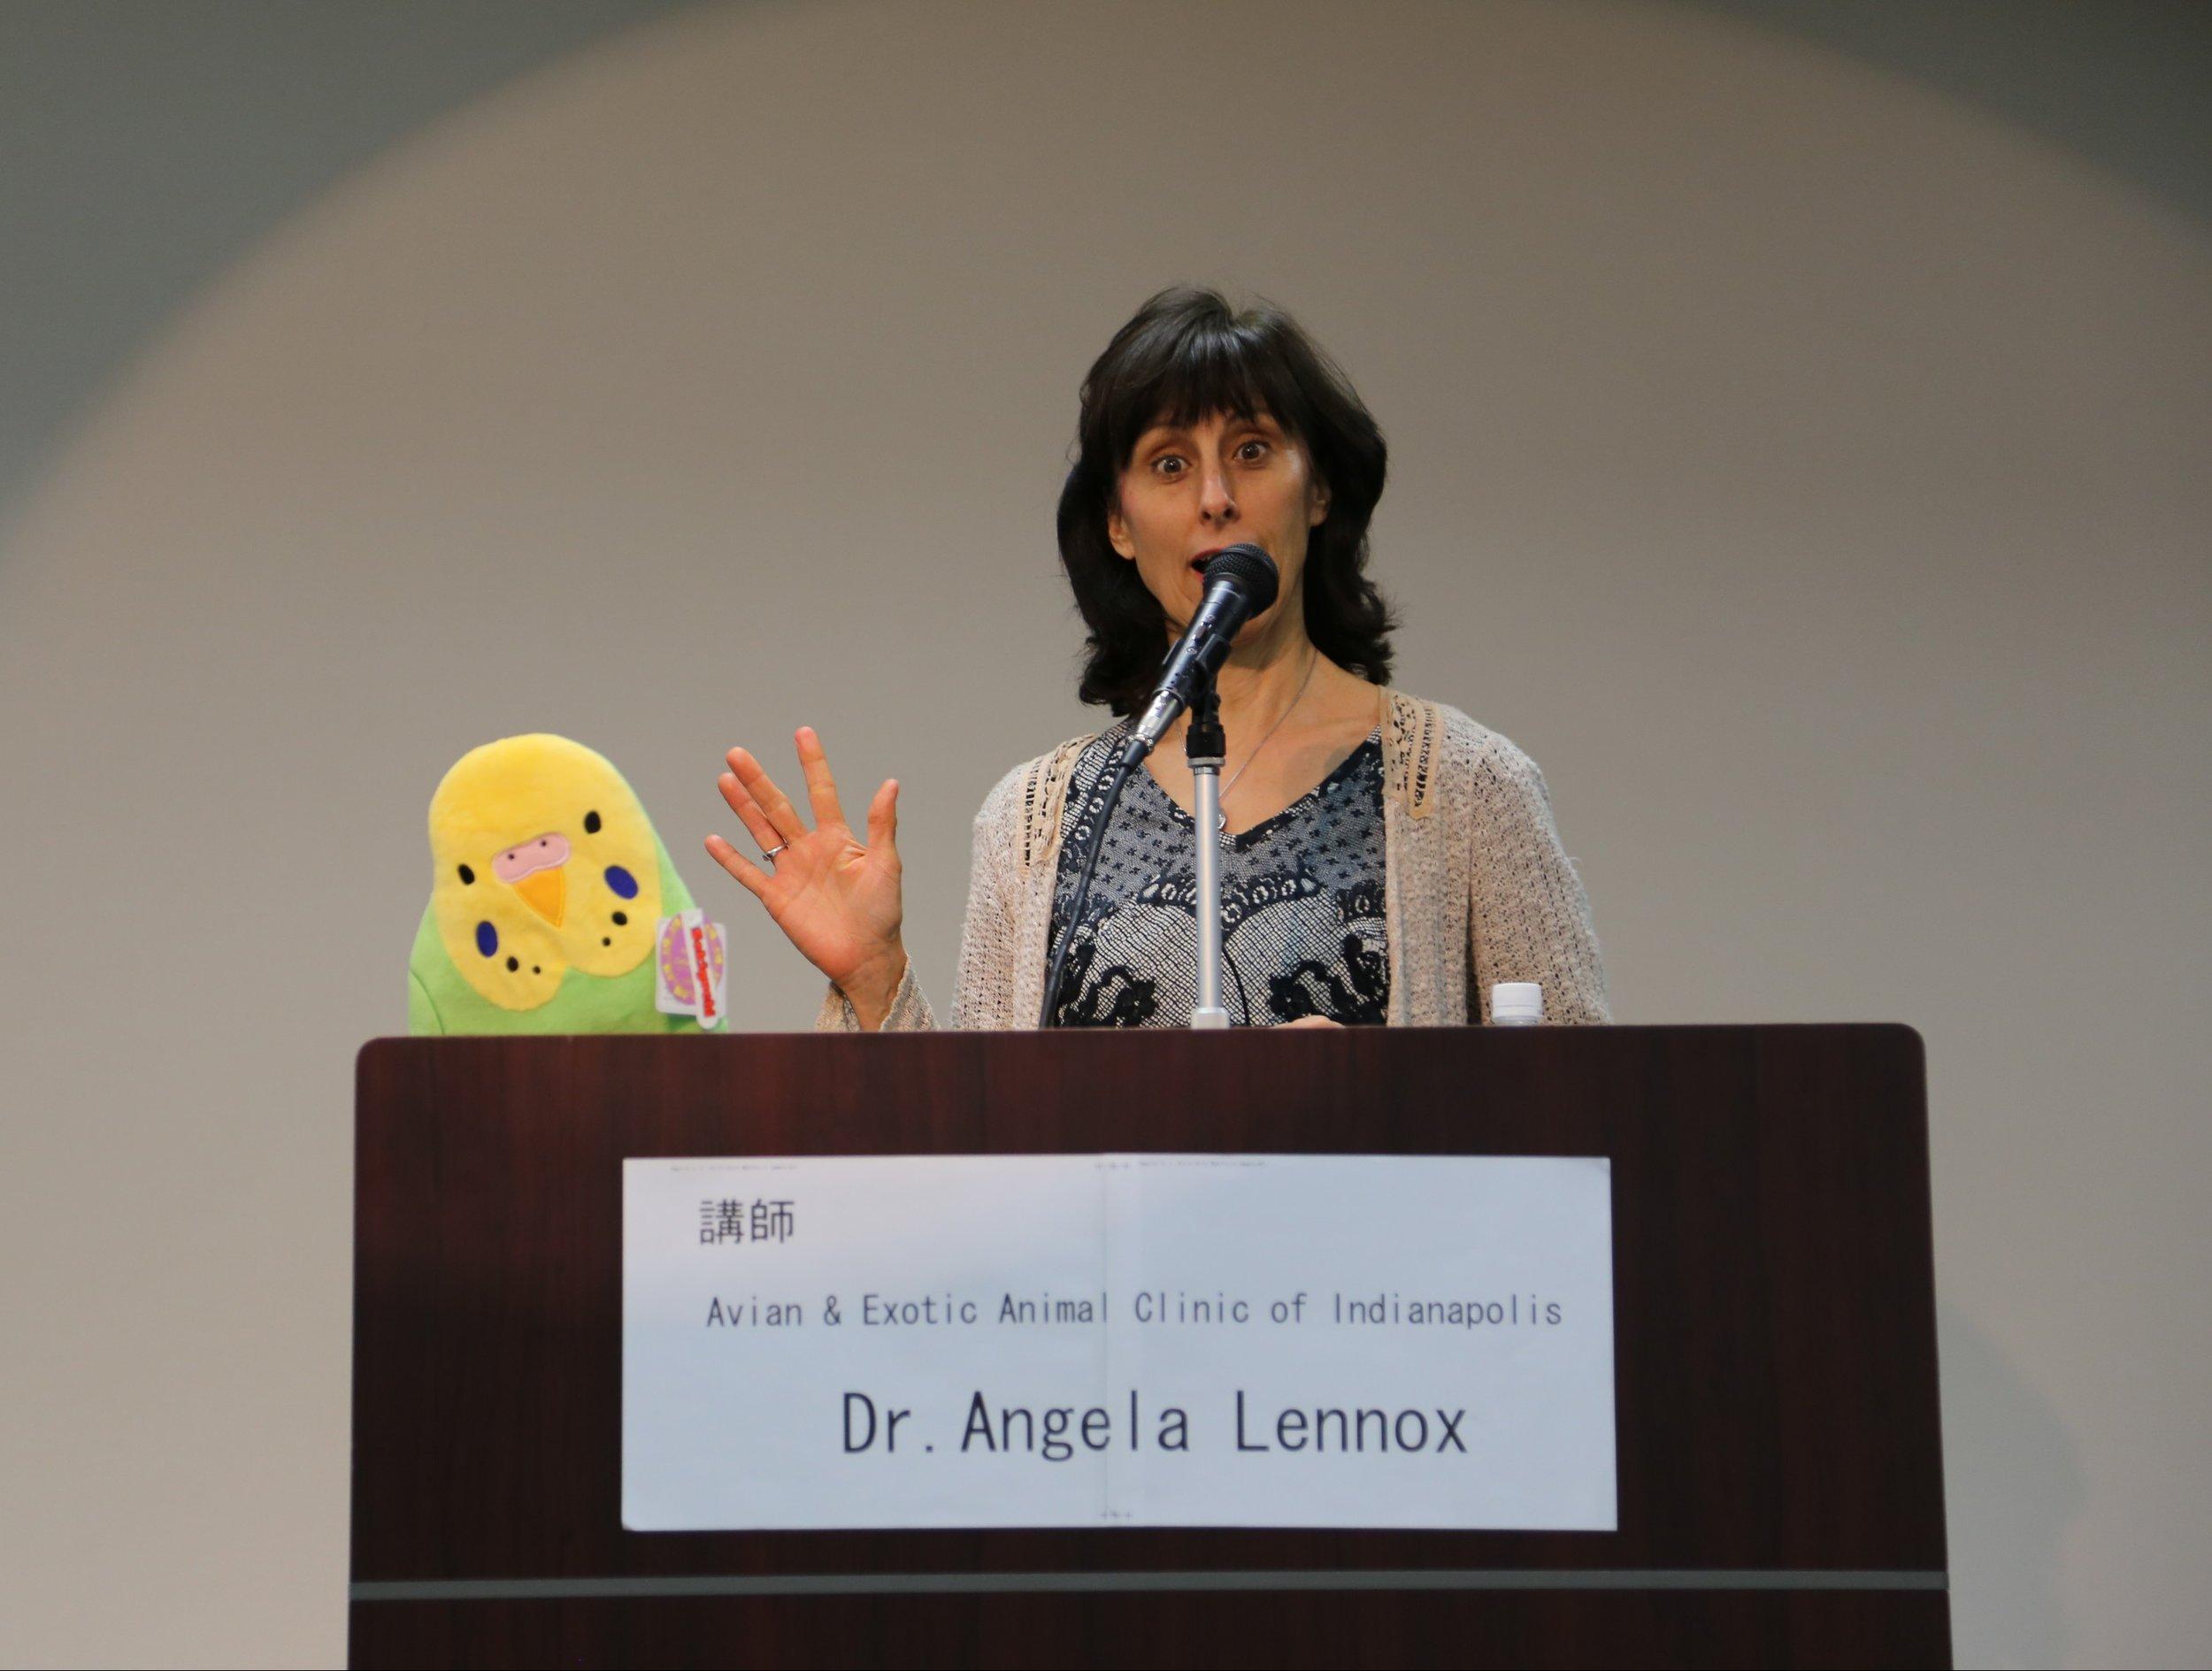 Angela-na-Bird-e1451858737133.jpg